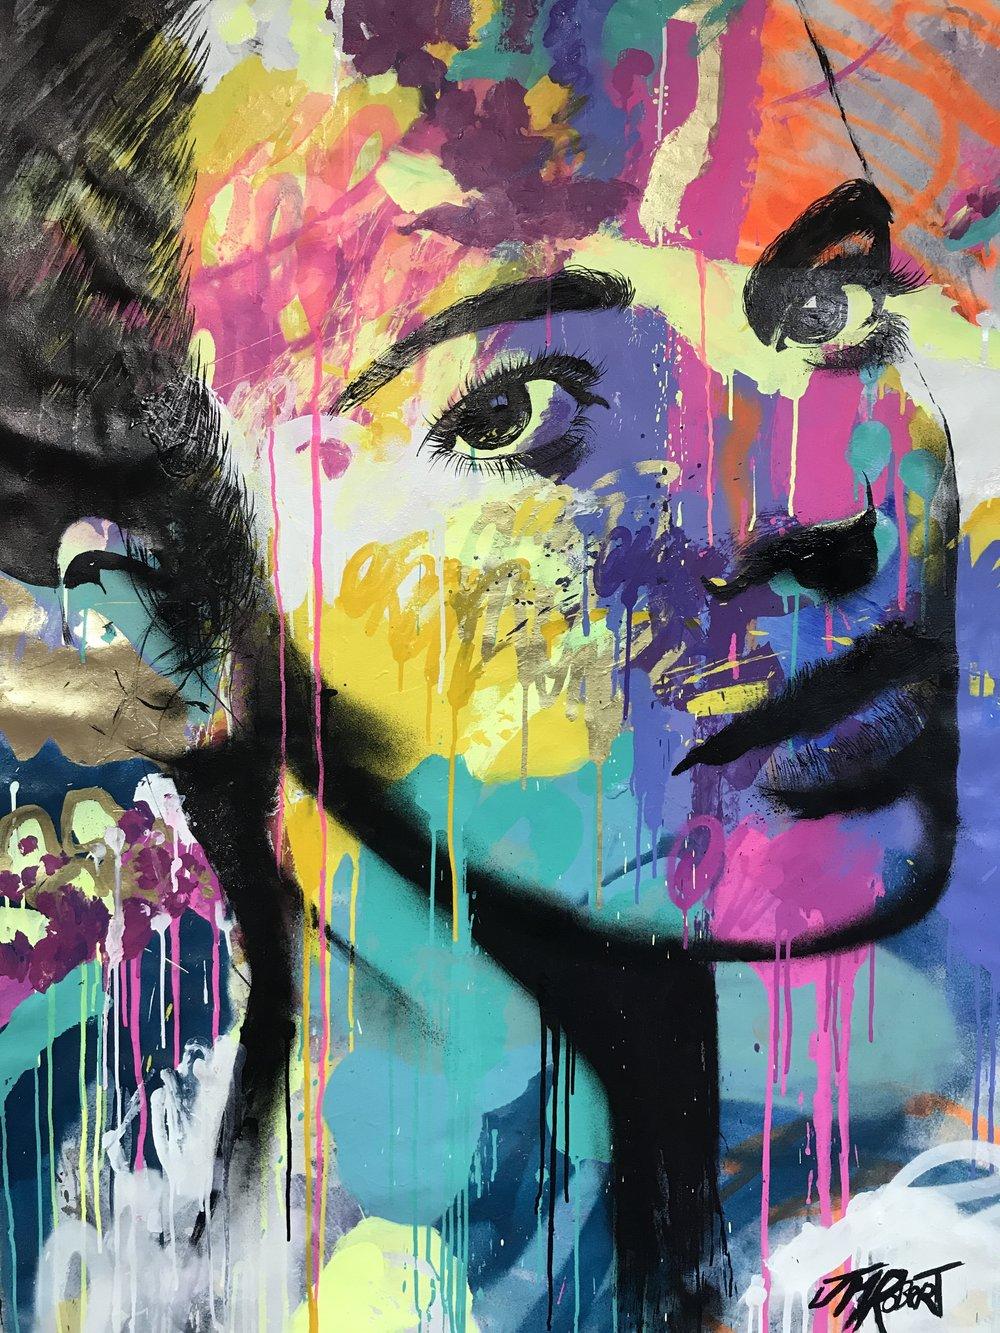 """She looks away"" Spray, Ink, Acrylic 142 x 96 cm 2018"